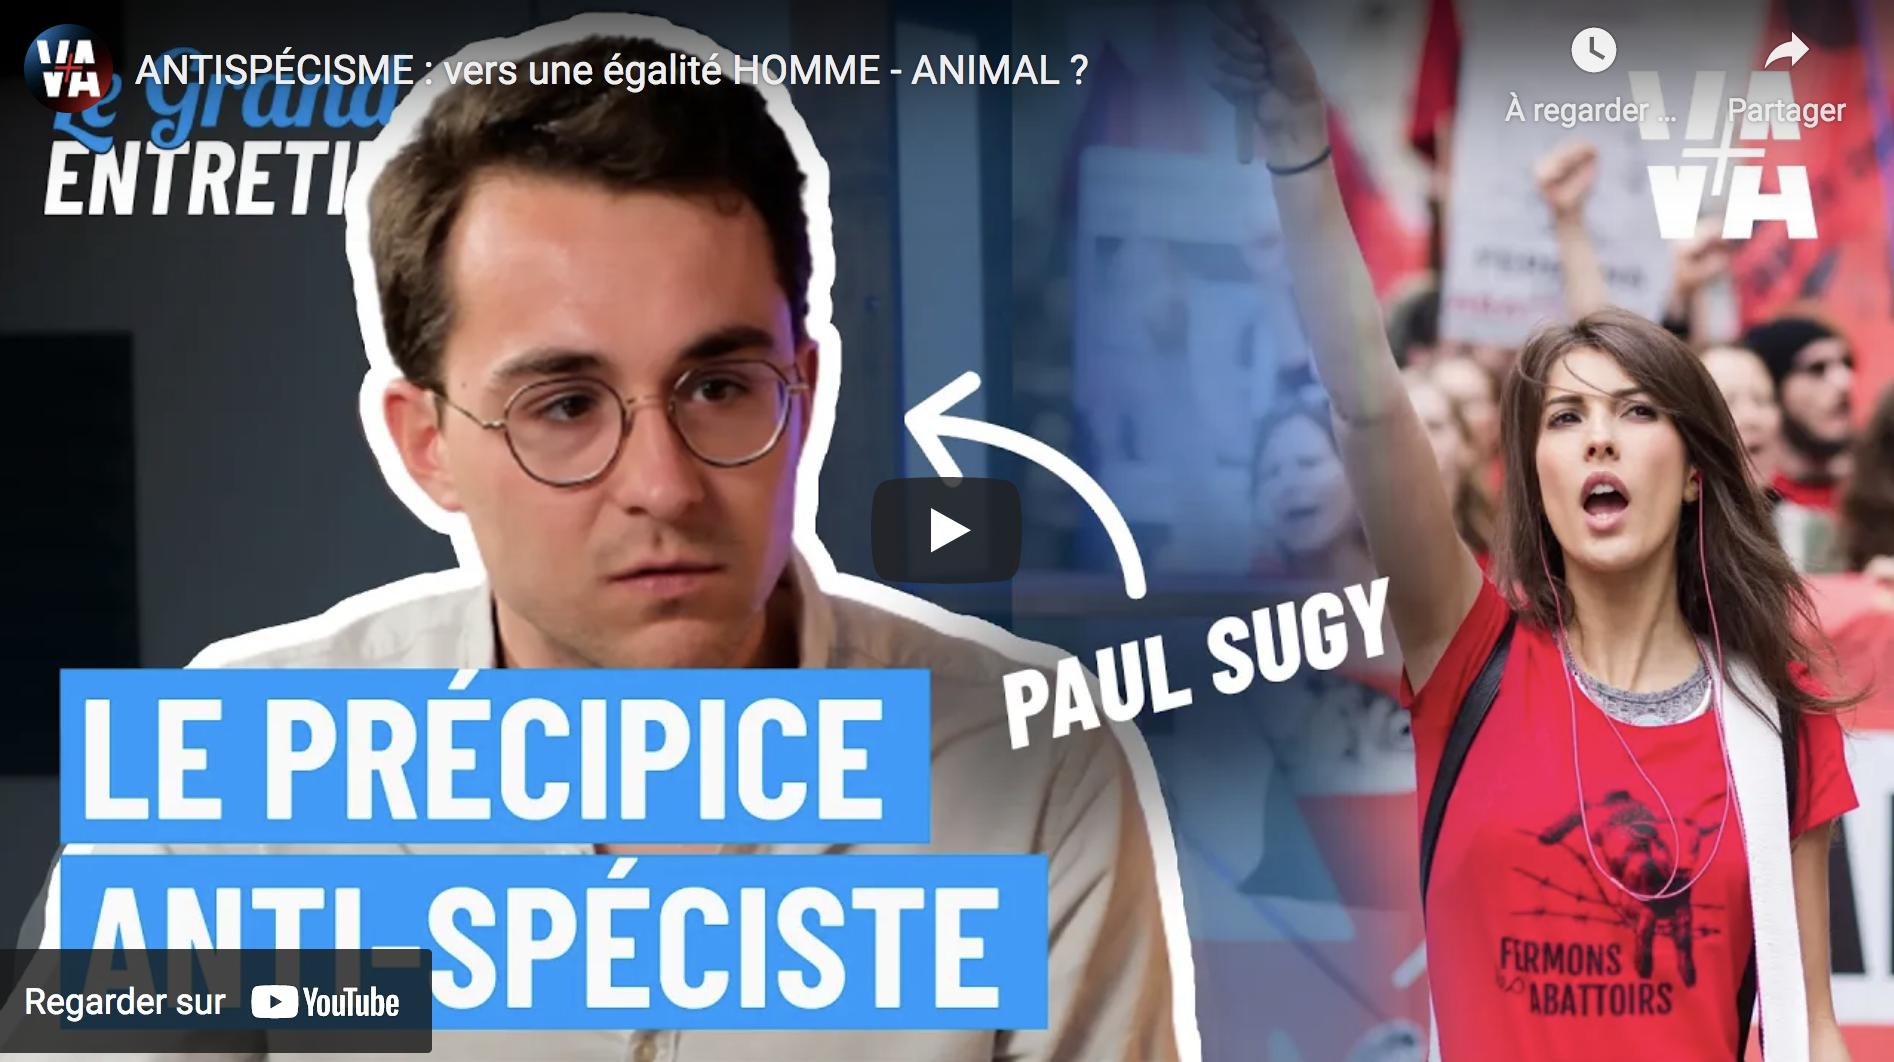 Paul Sugy : Le précipice antispéciste (ENTRETIEN)